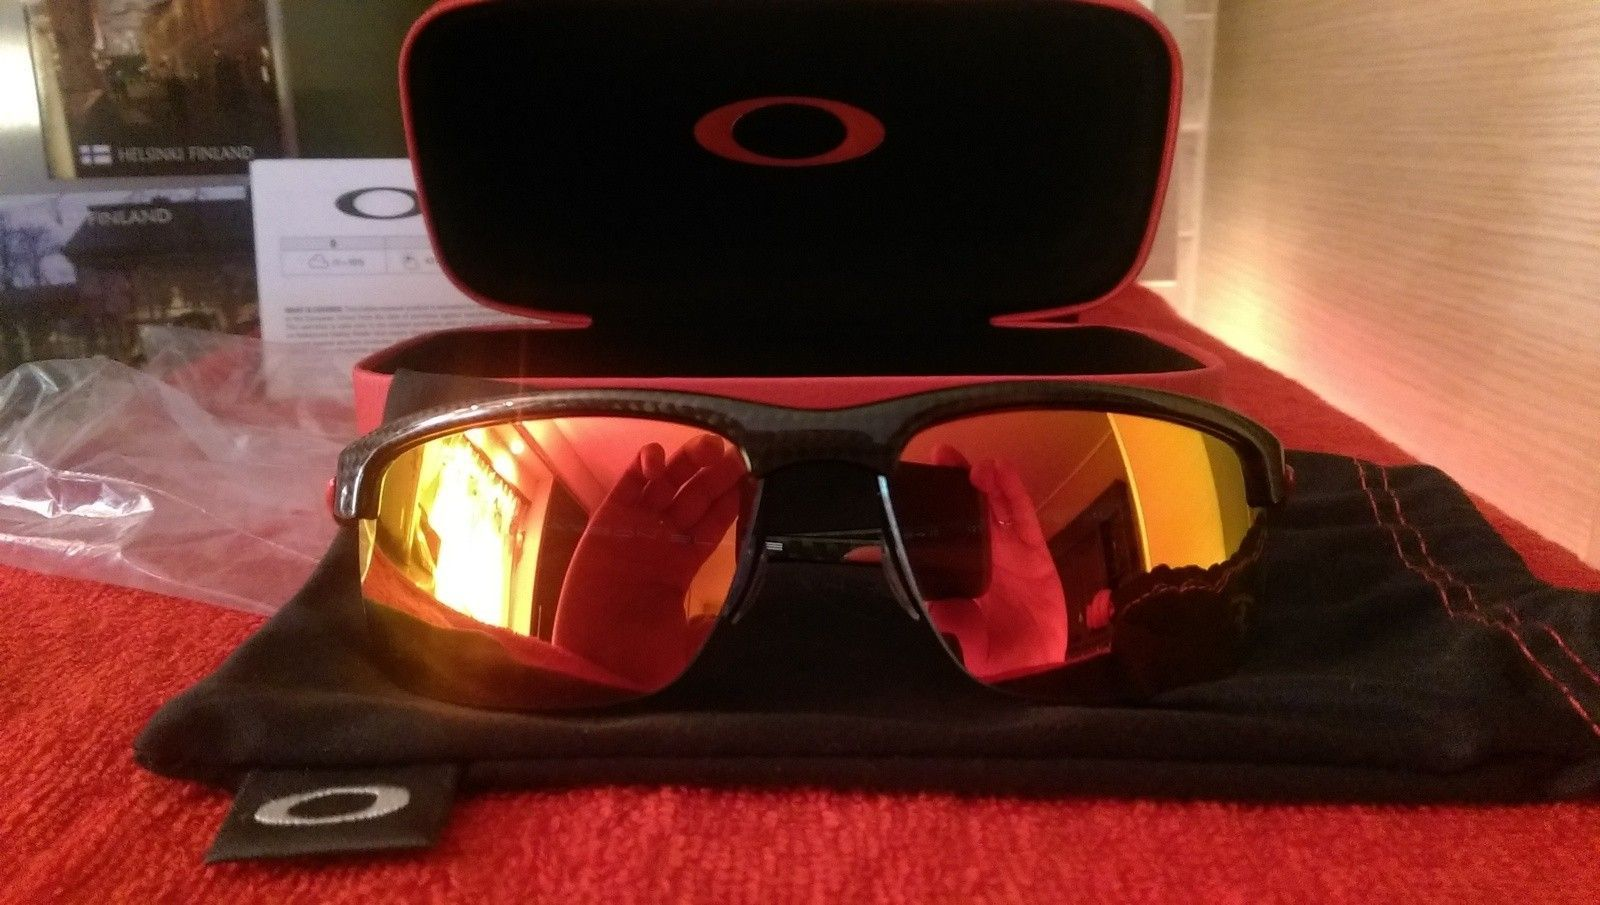 Oakley Scuderia Ferrari Carbon Blade ***Price Drop*** - uploadfromtaptalk1452608180046.jpg